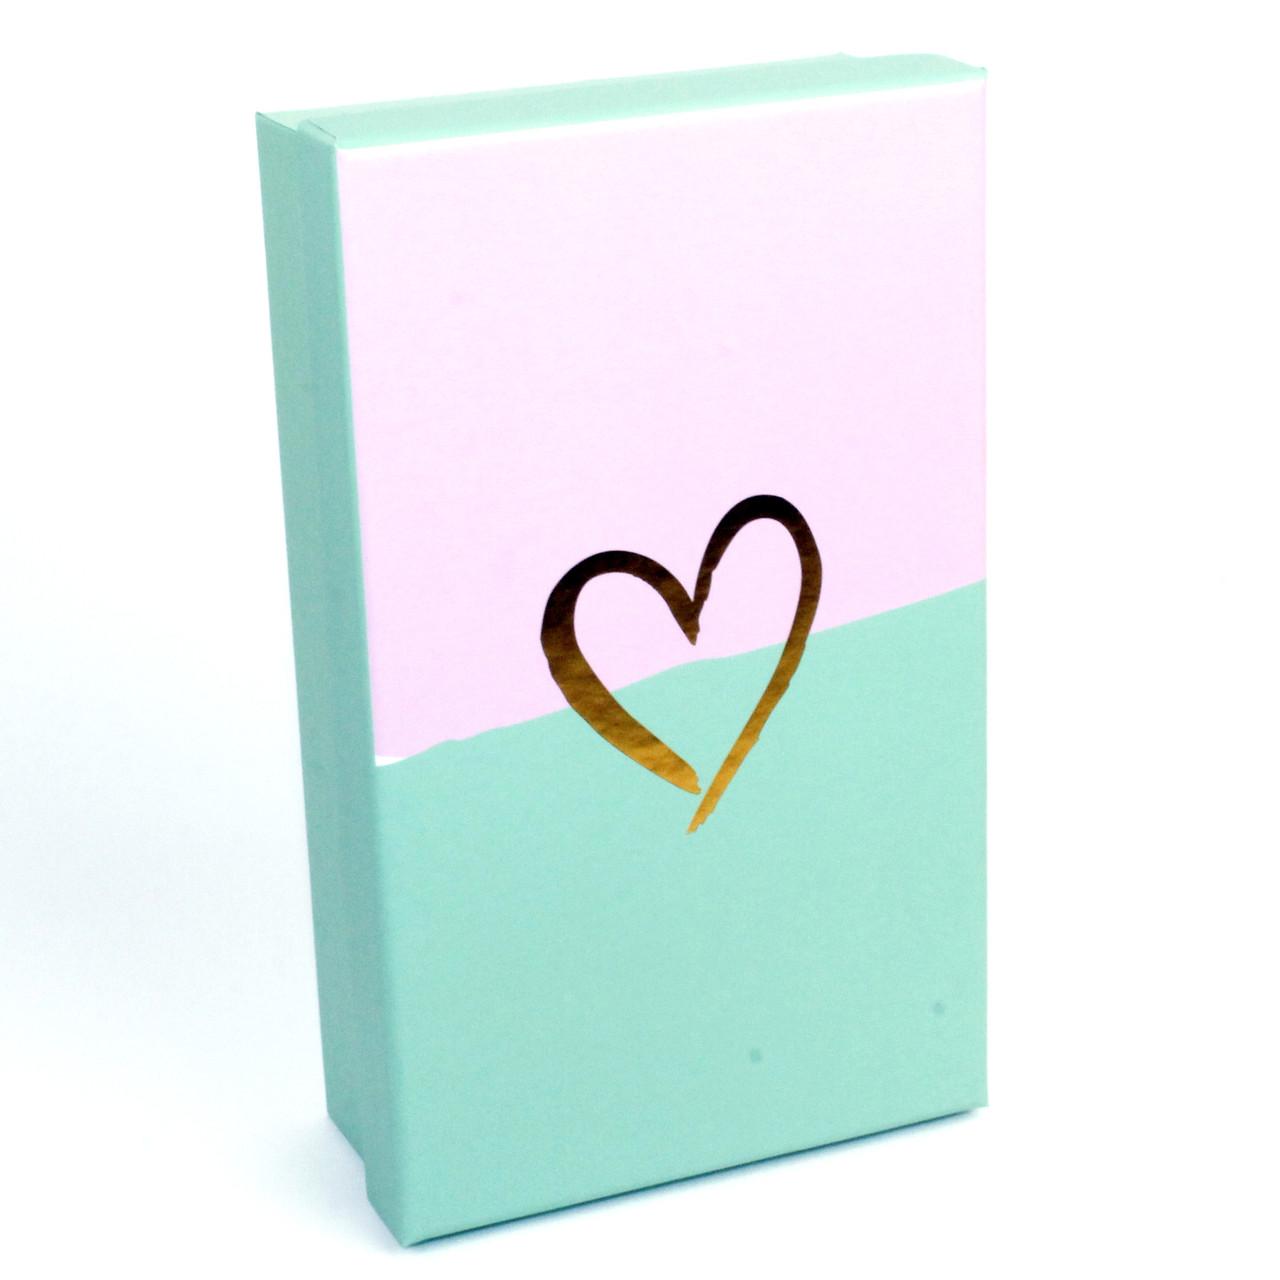 Подарочная коробка With All My Heart 18 x 11 x 4.5 см